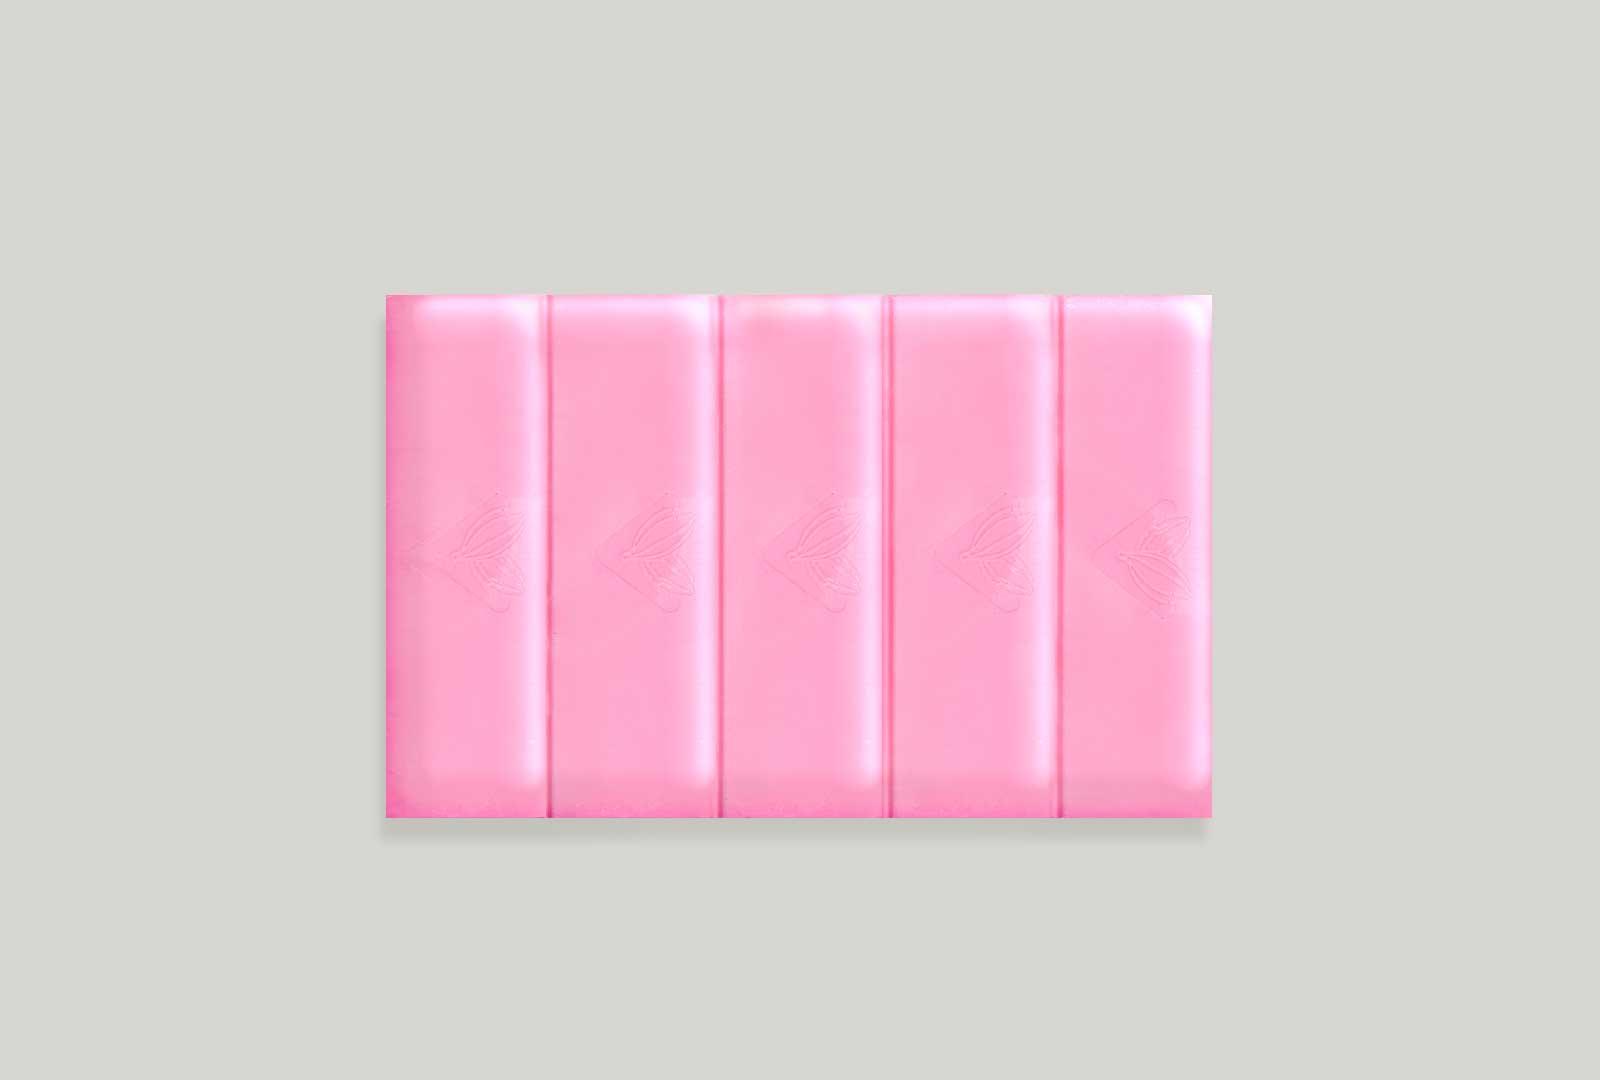 glossy-strawberry-chocolate-compound-1